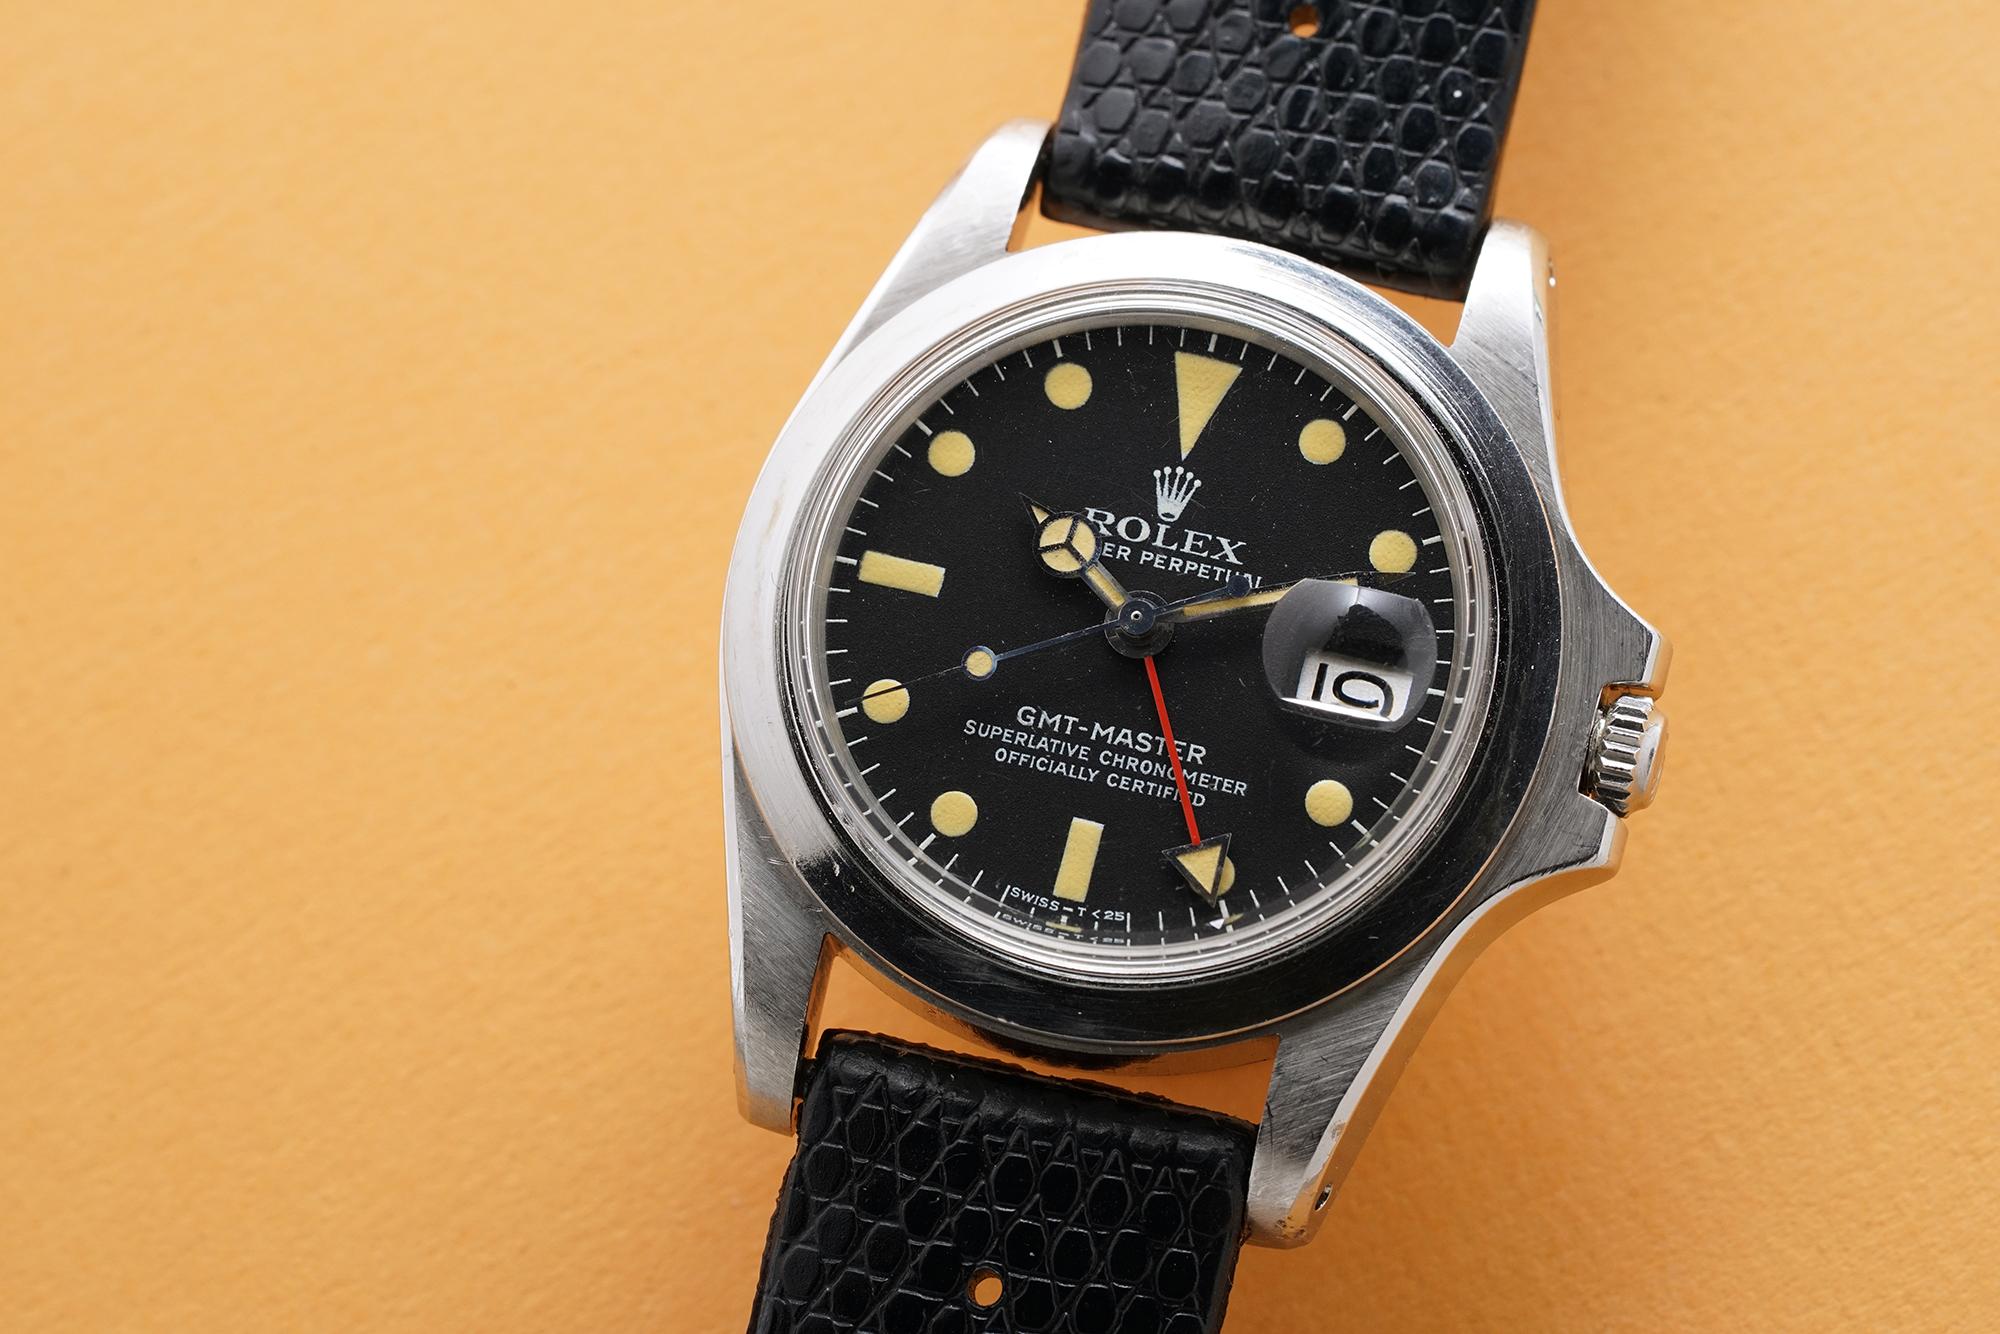 Marlon Brando Rolex 1675 GMT-Master